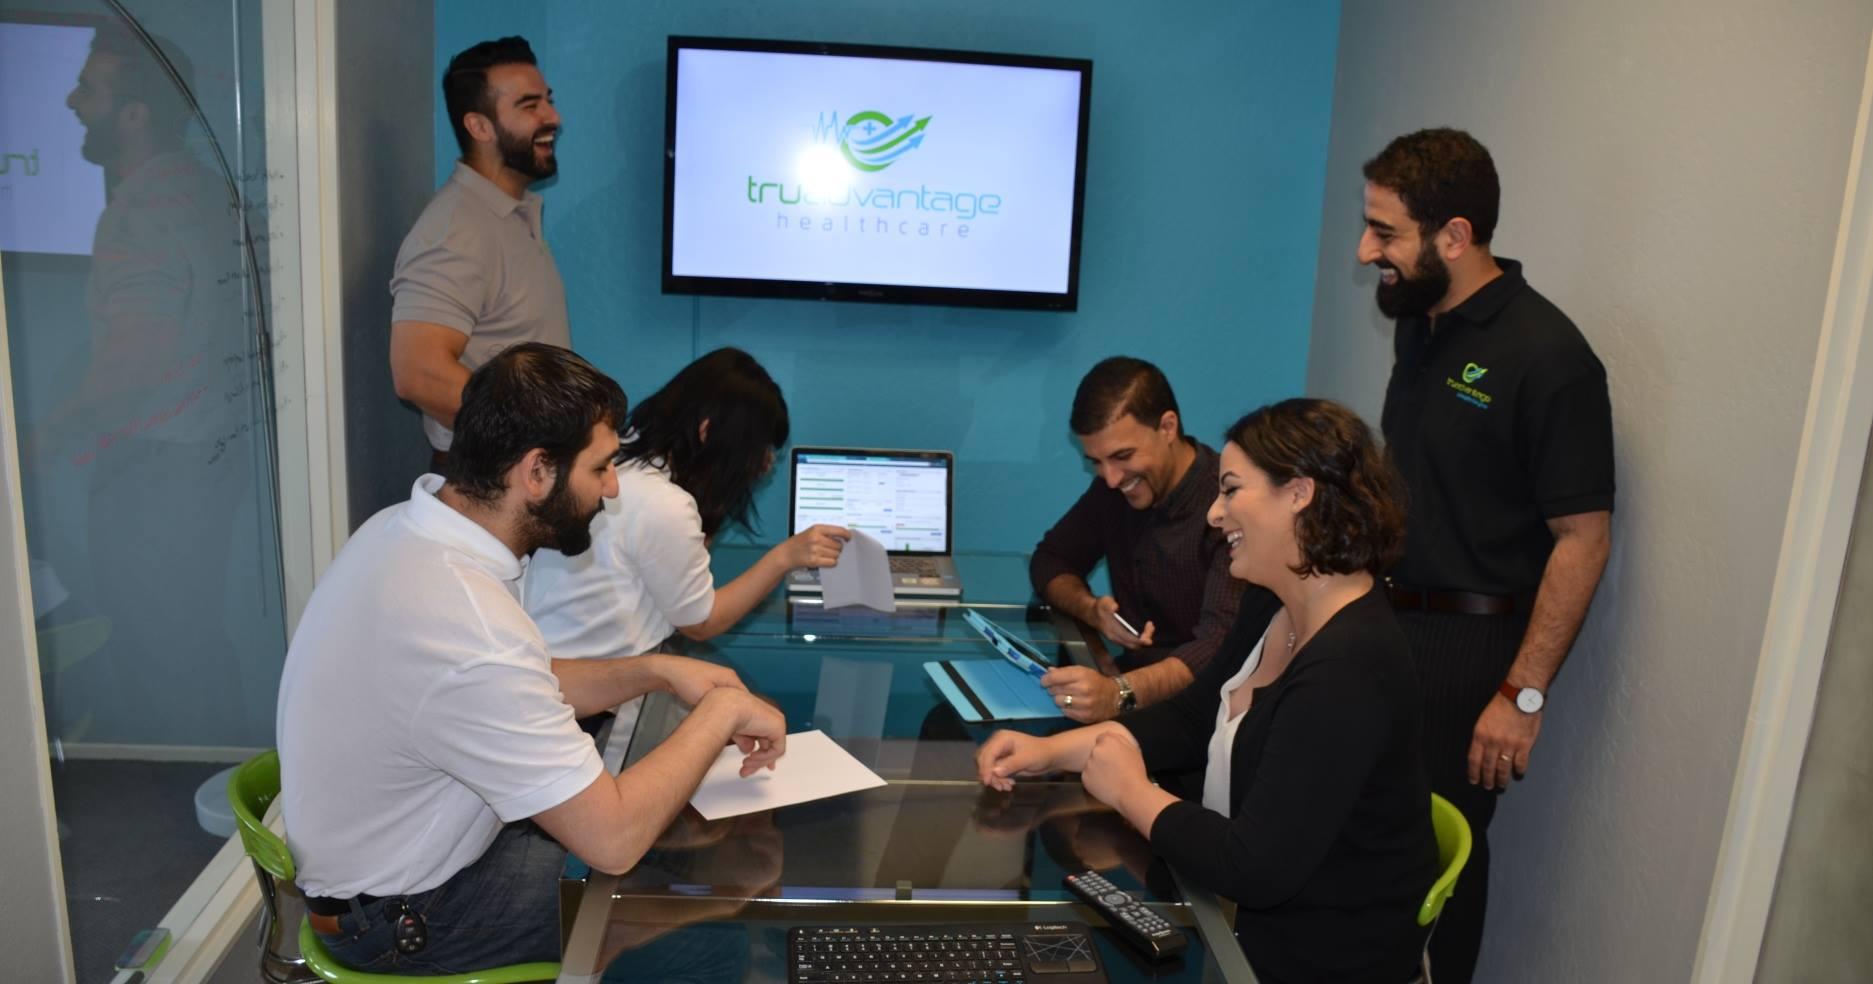 meet the team behind truadvantage truadvantage